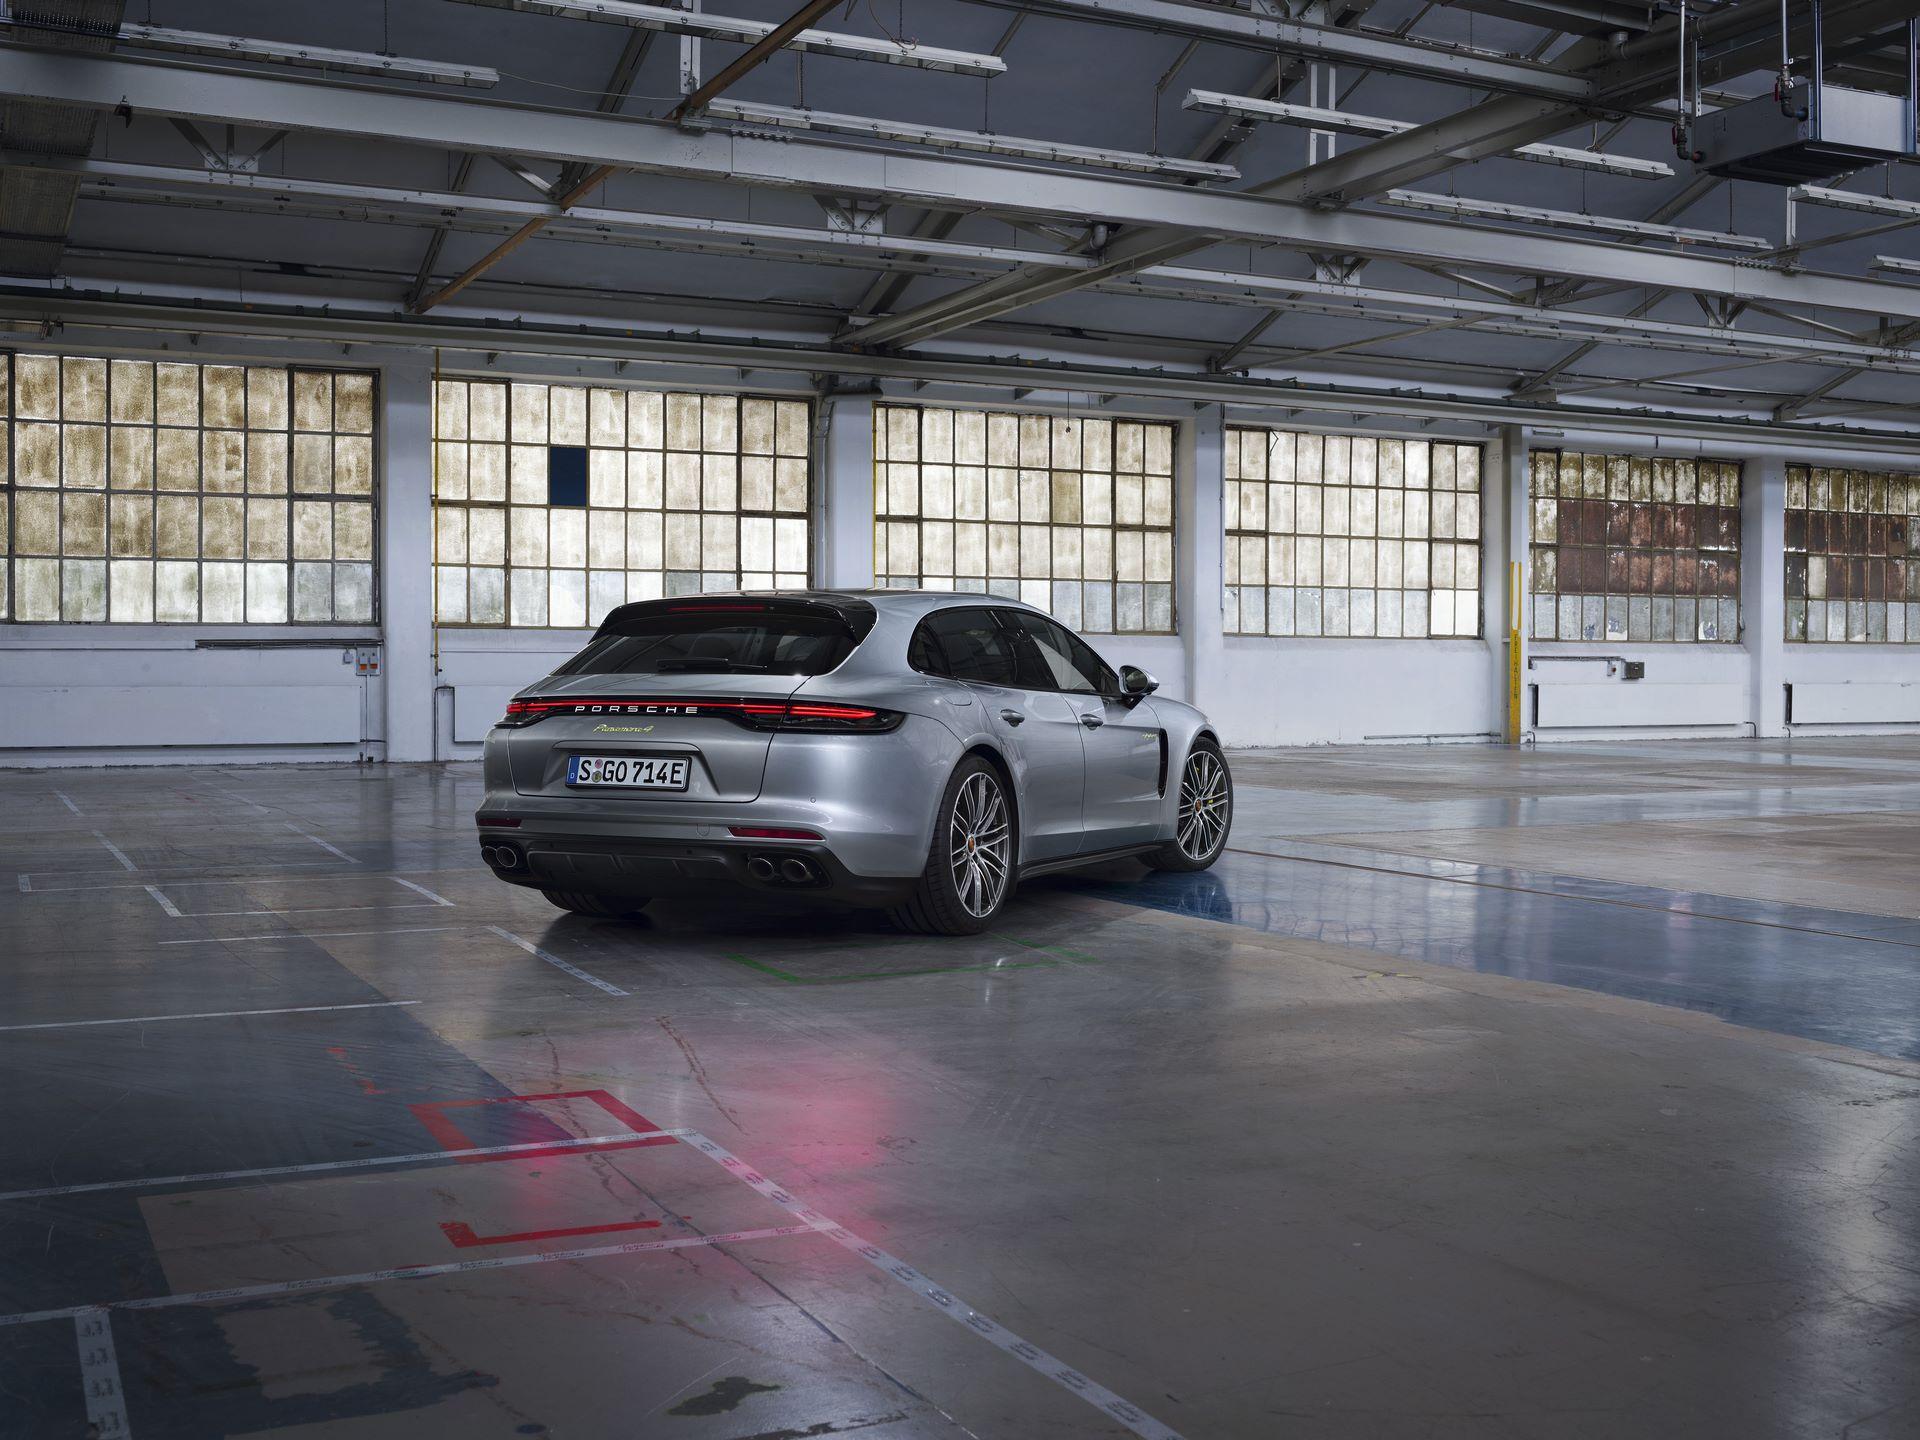 Porsche-Panamera-Turbo-S-E-Hybrid-4-E-Hybrid-and-4S-2021-6